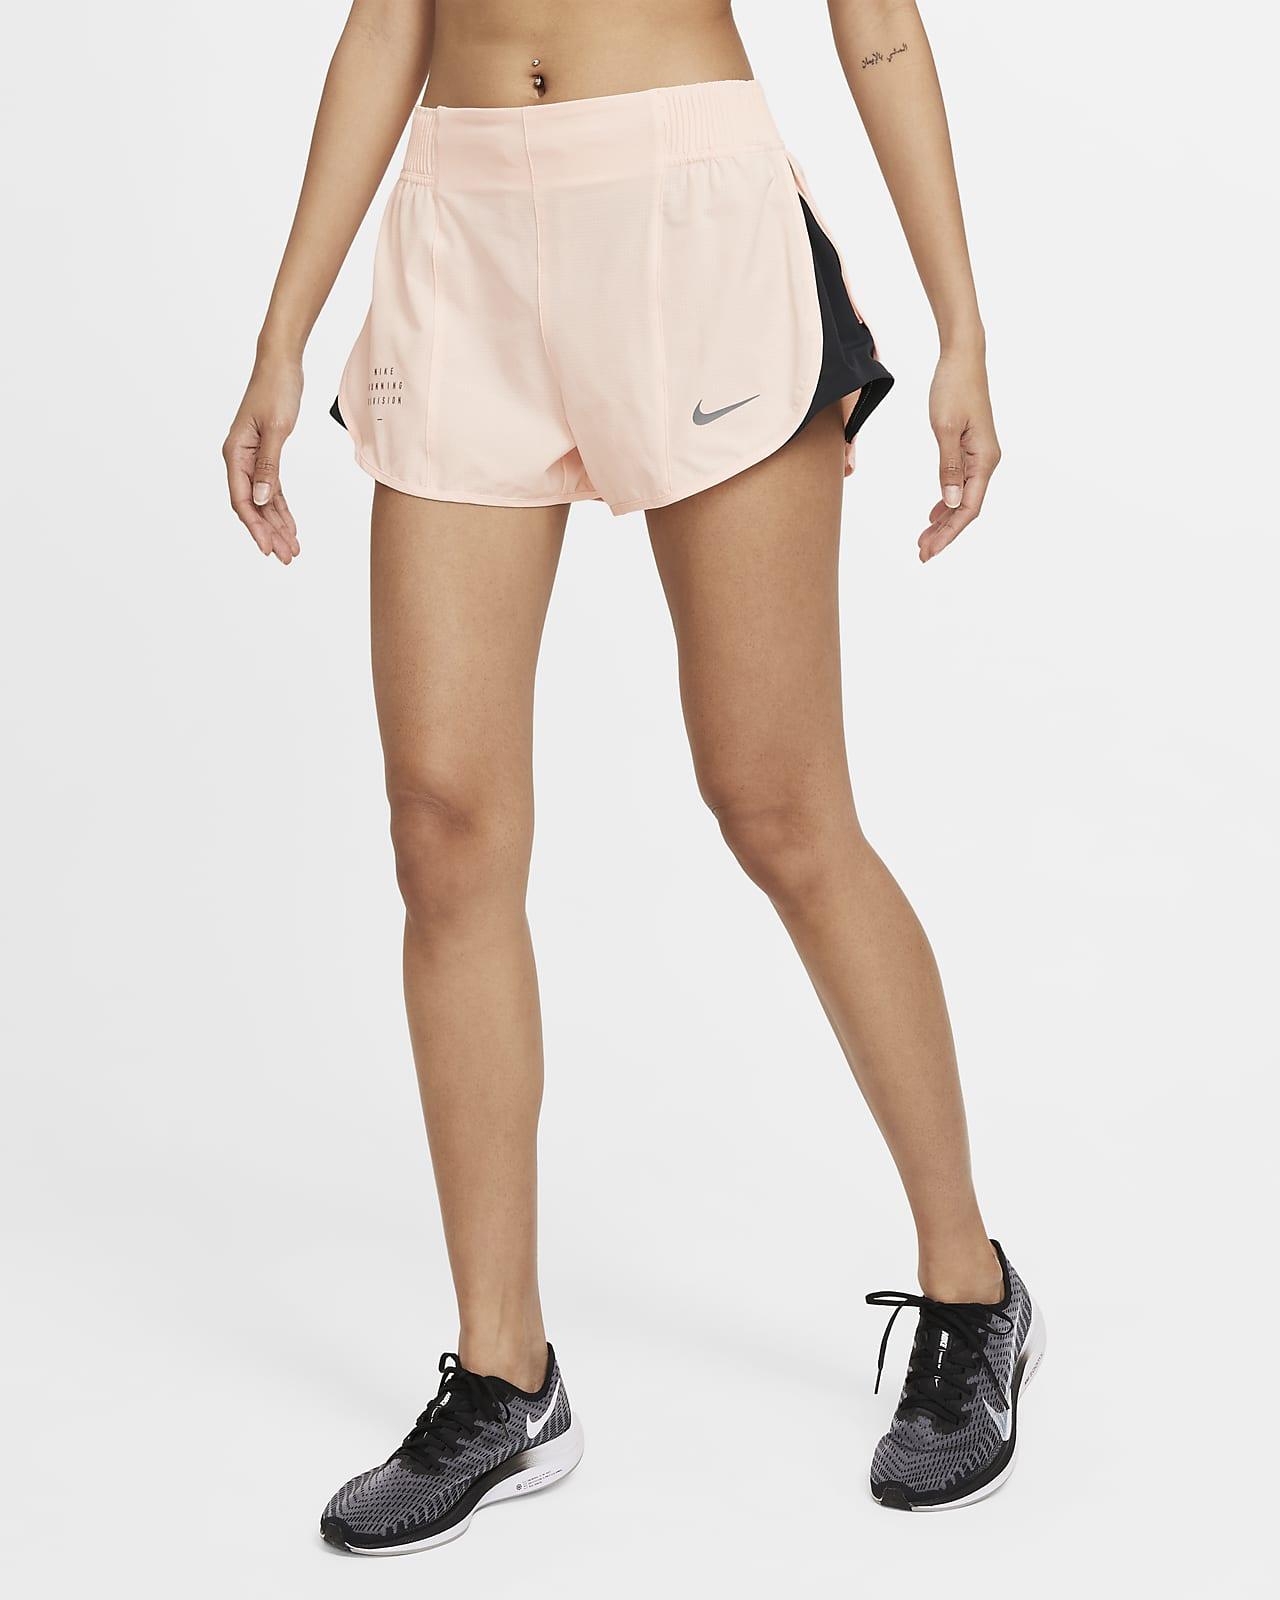 Shorts de running para mujer Nike Dri-FIT Run Division Tempo Luxe